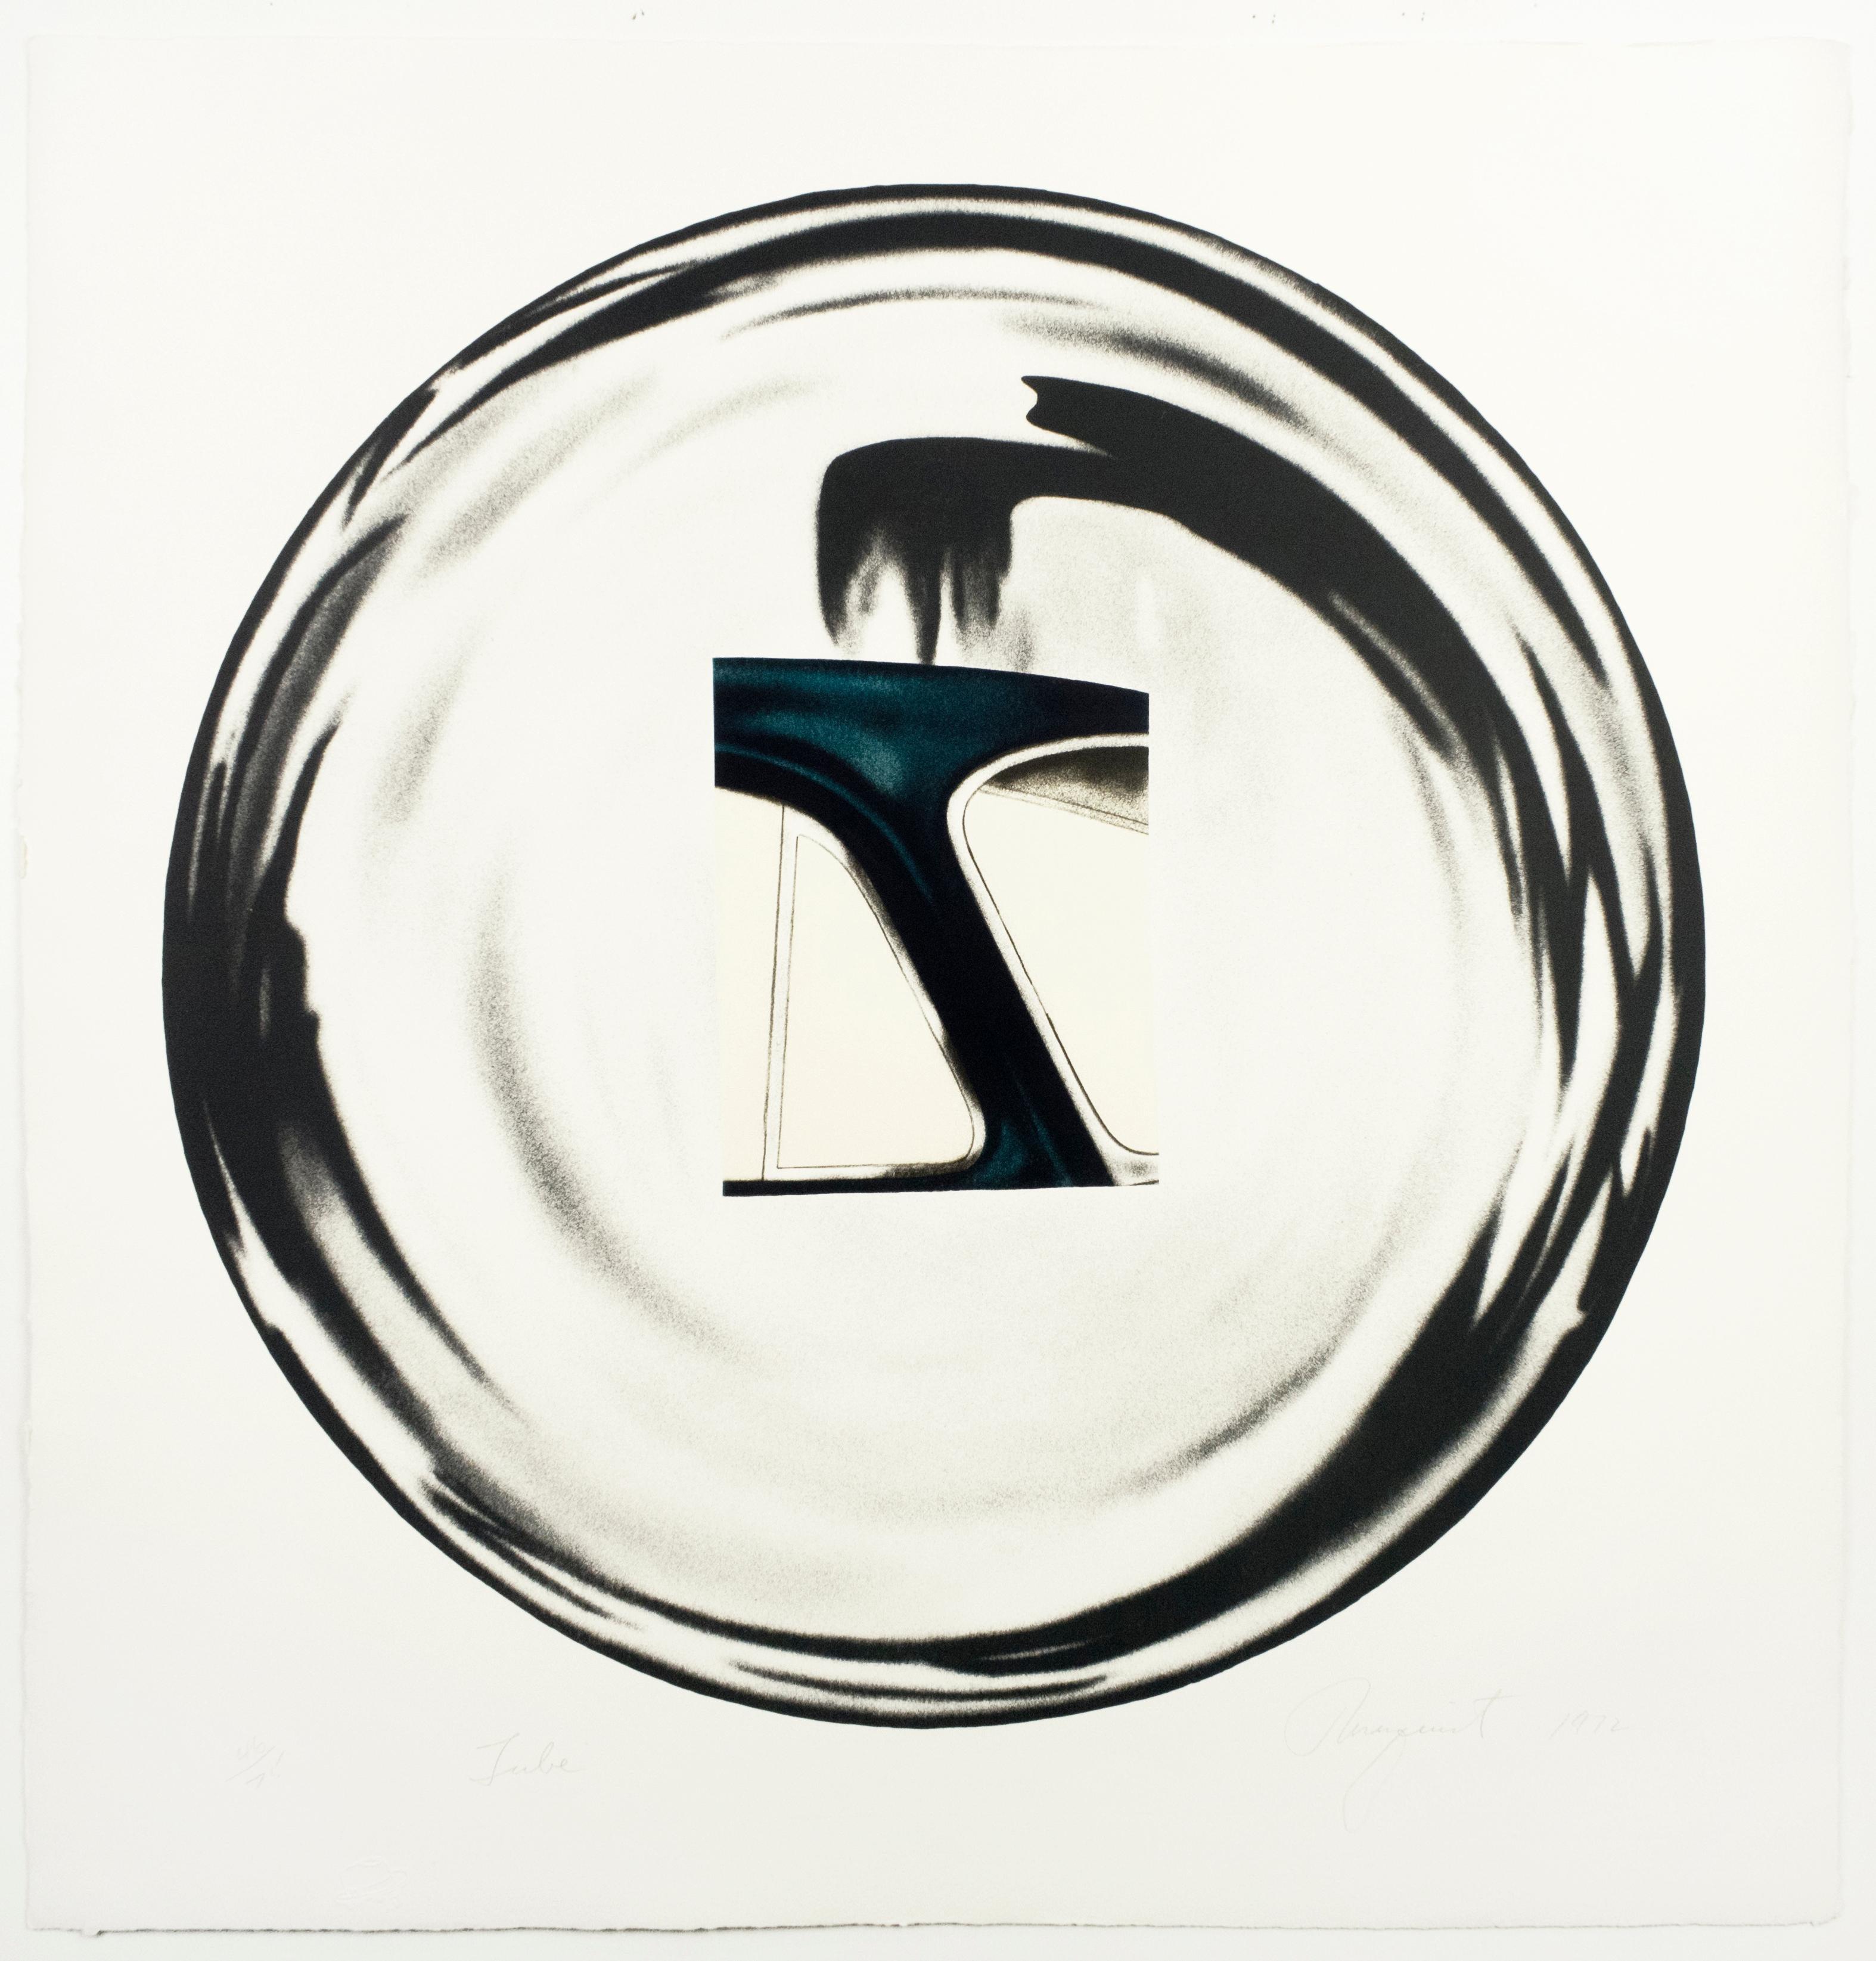 Tube James Rosenquist Black and white abstract Pop art chrome based on painting